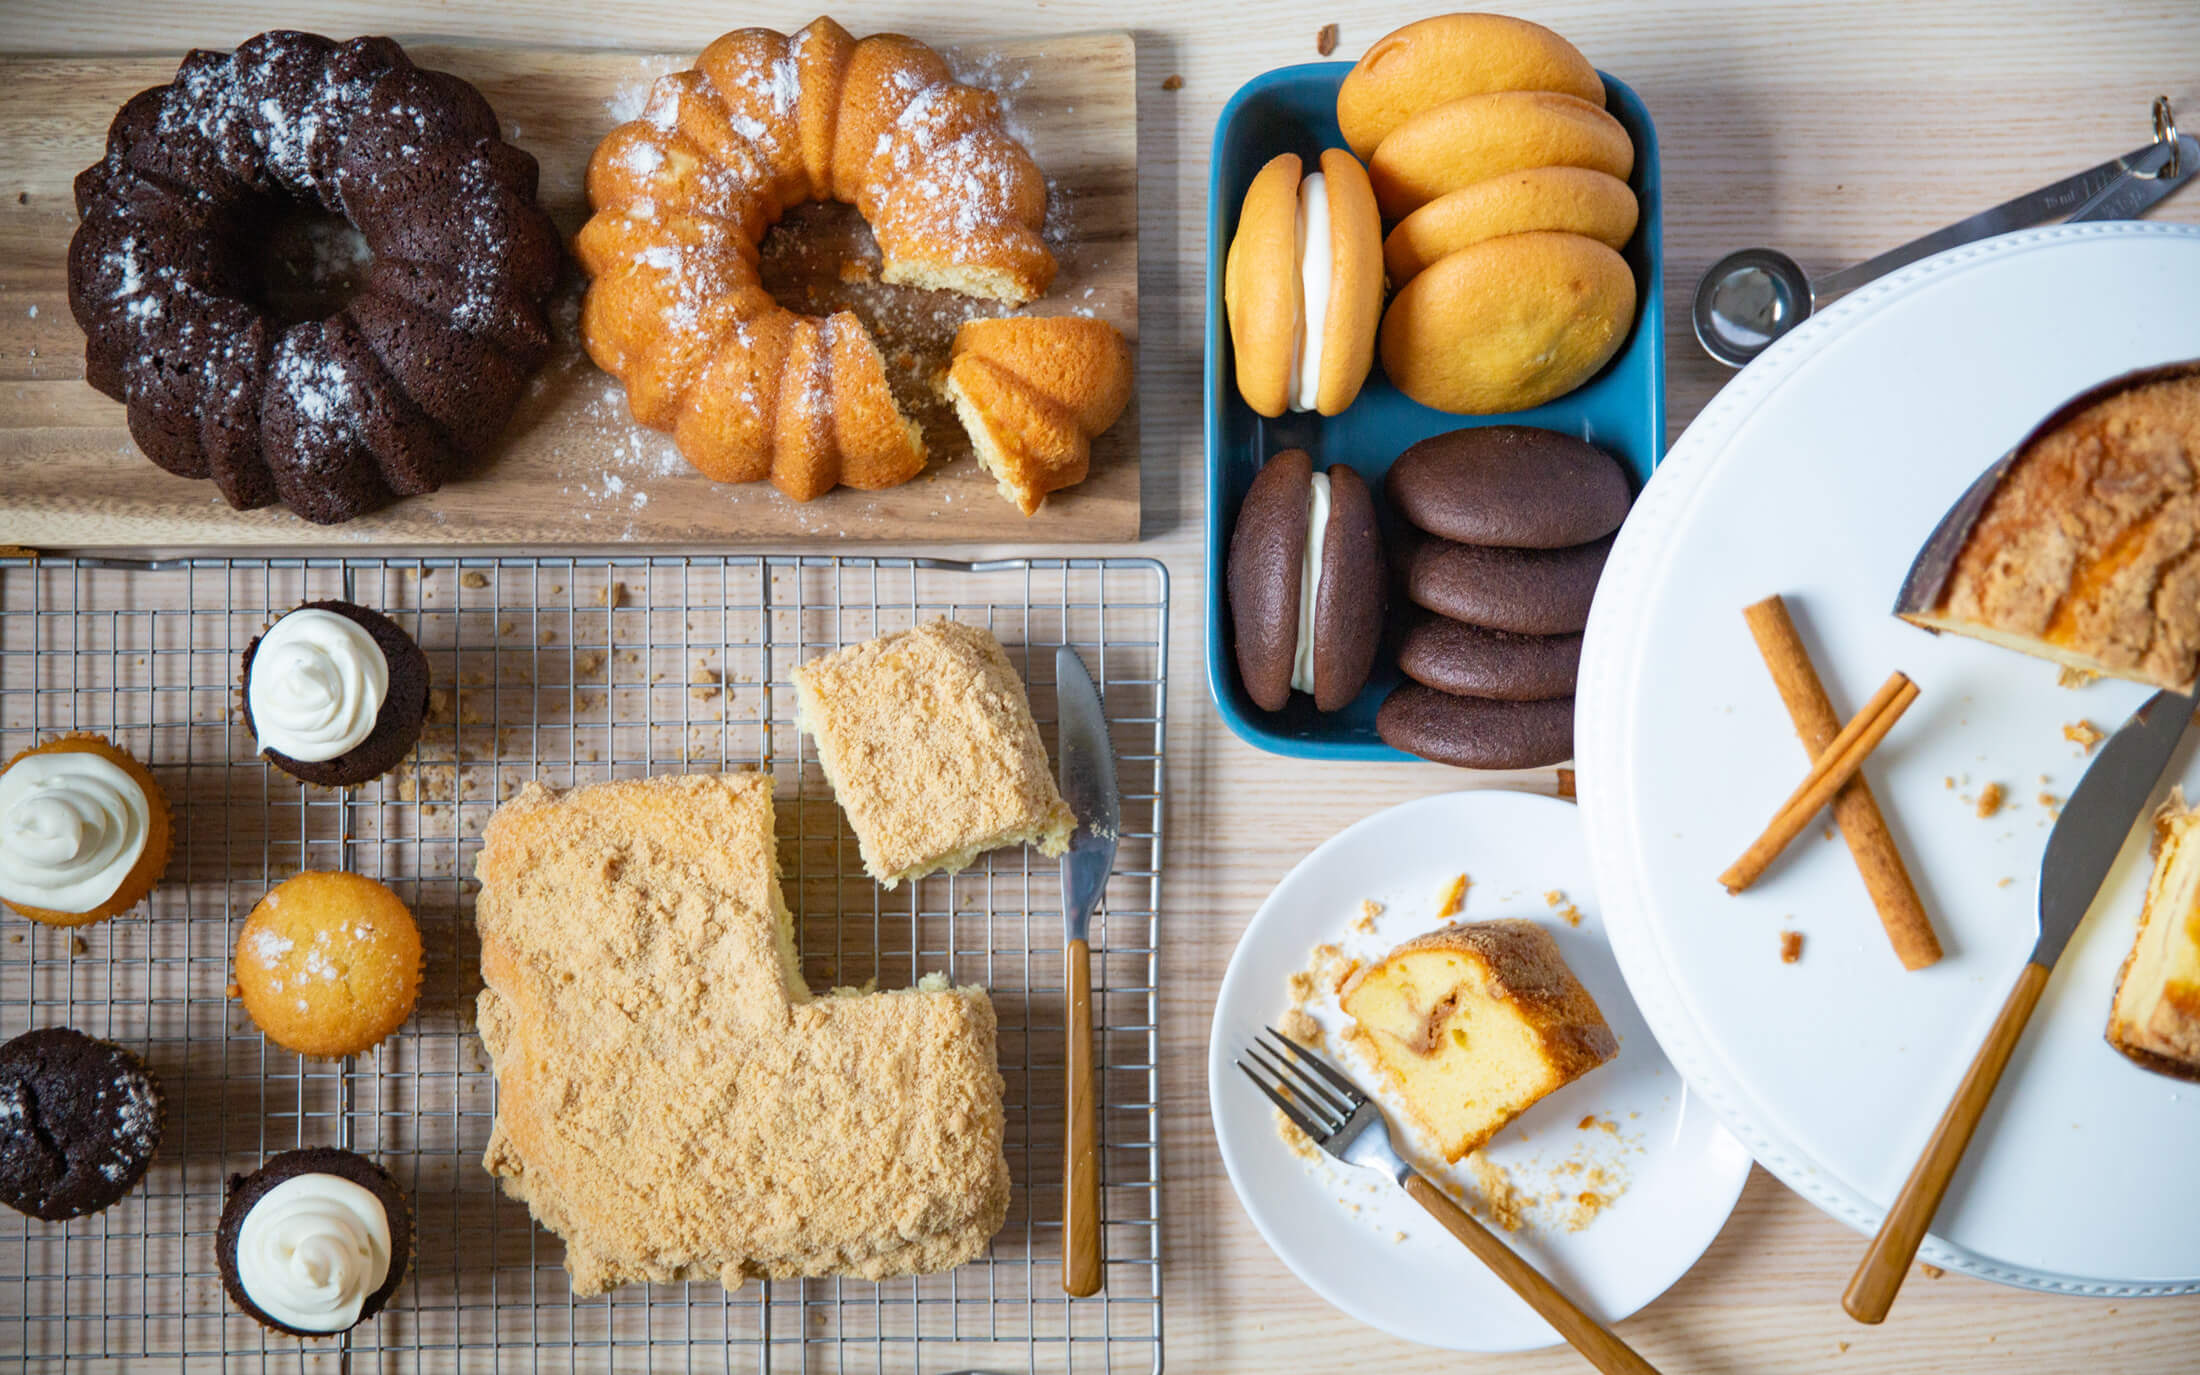 A variety of Boston Baking cakes